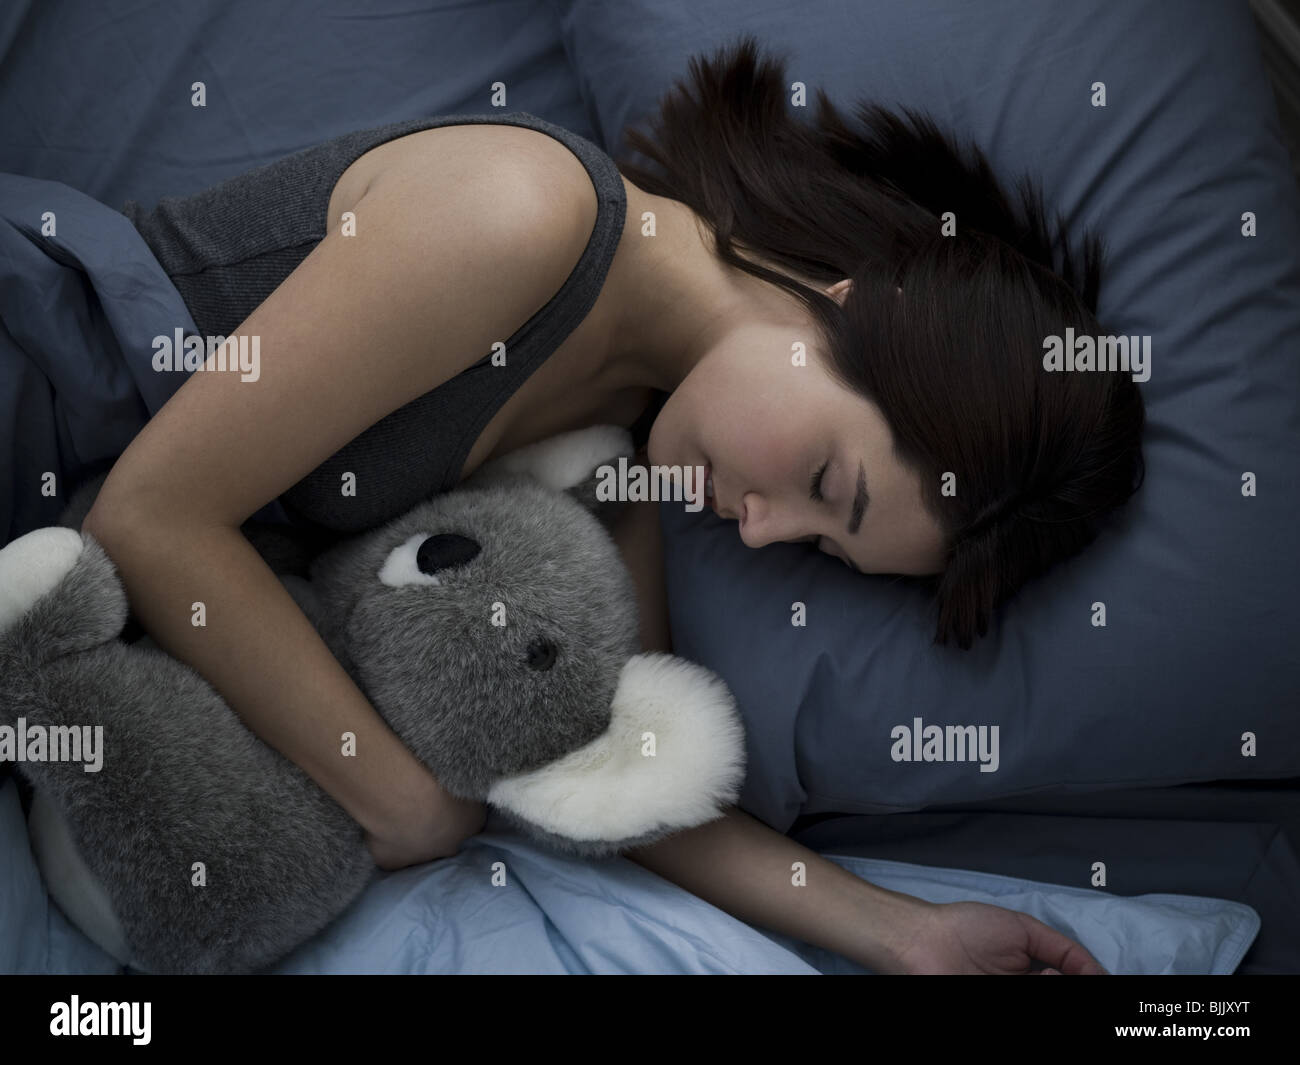 Woman sleeping in bed with stuffed animal - Stock Image